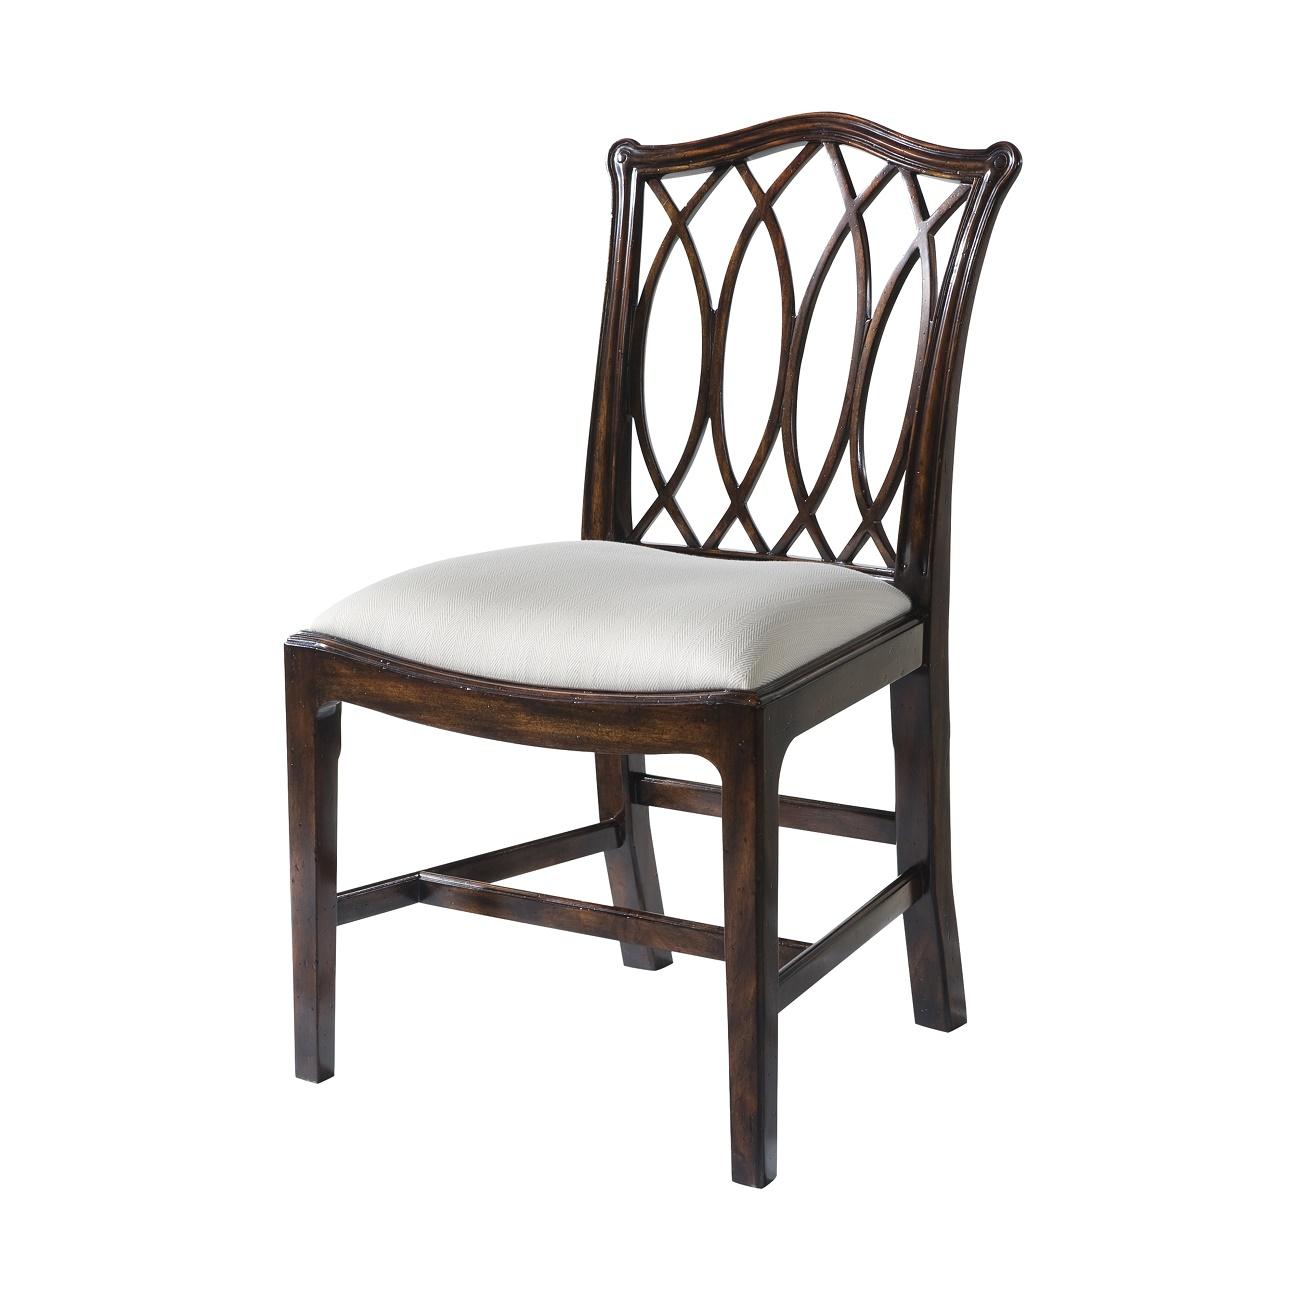 The Trellis Chair Theodore Alexander